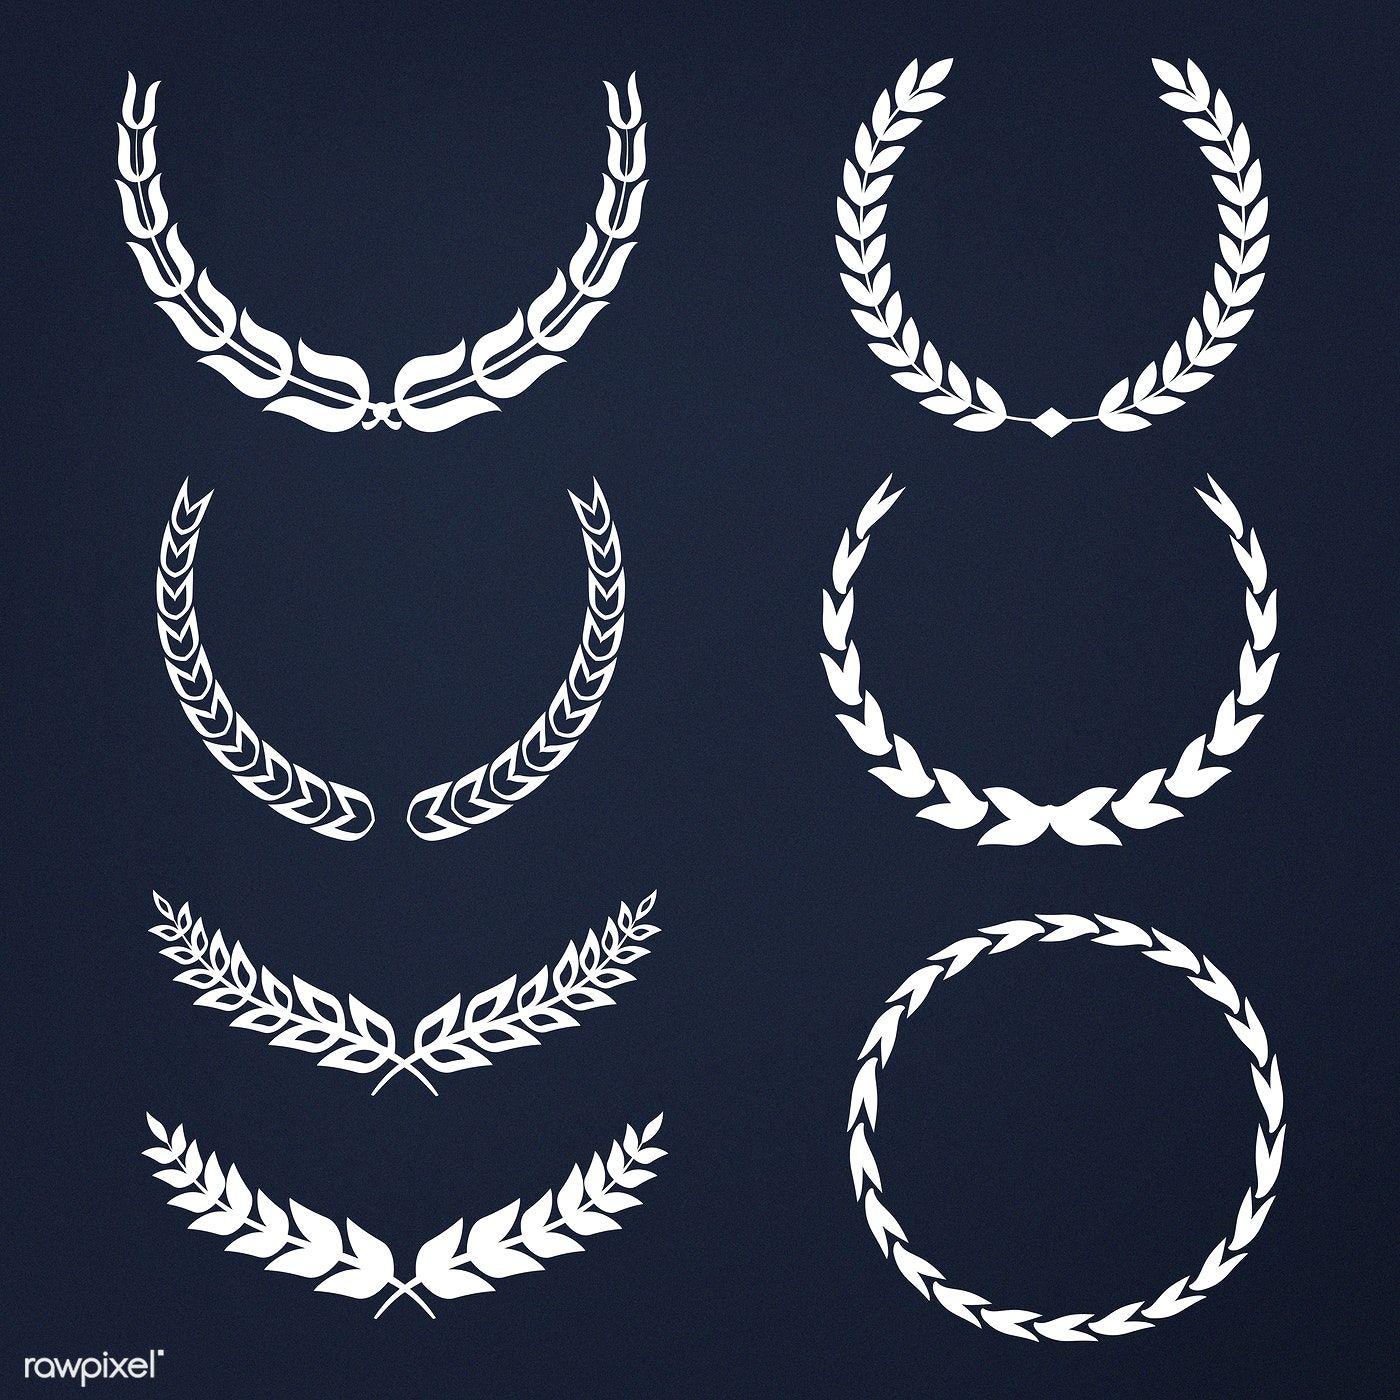 Set of laurel wreath illustration vectors free image by